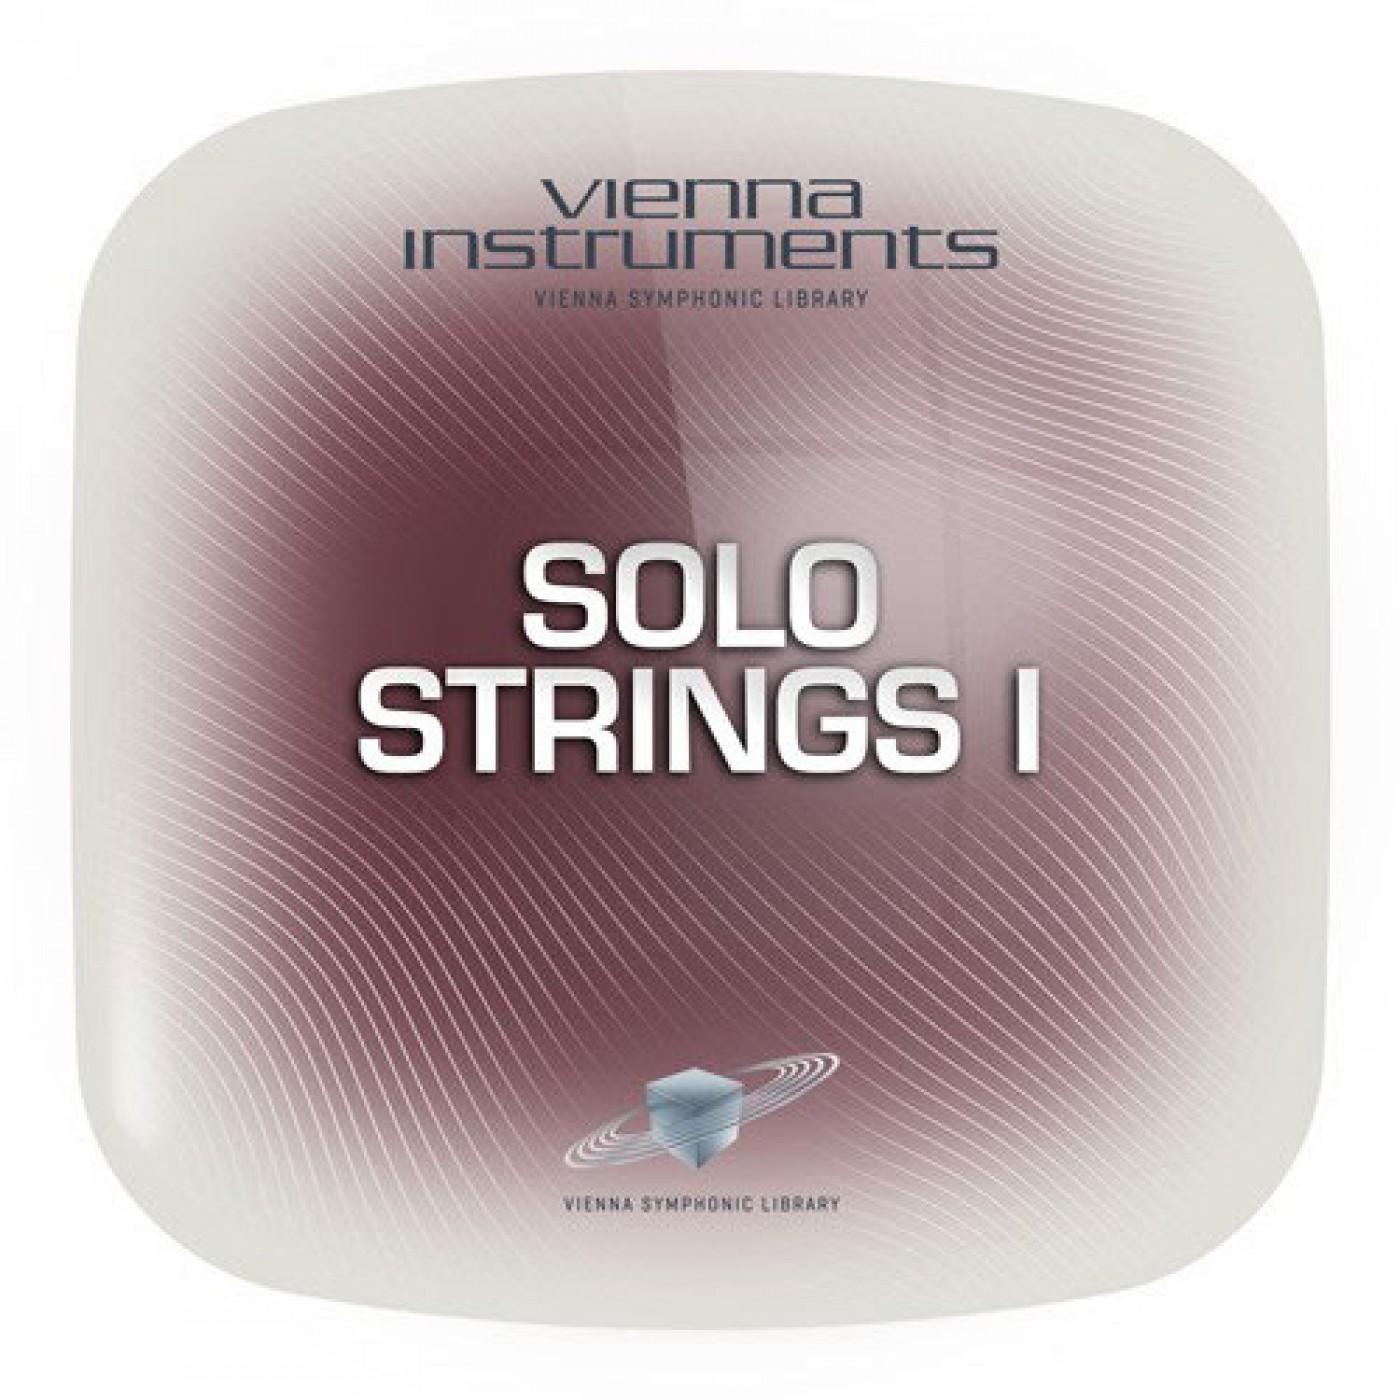 VSL Instruments SOLO STRINGS I